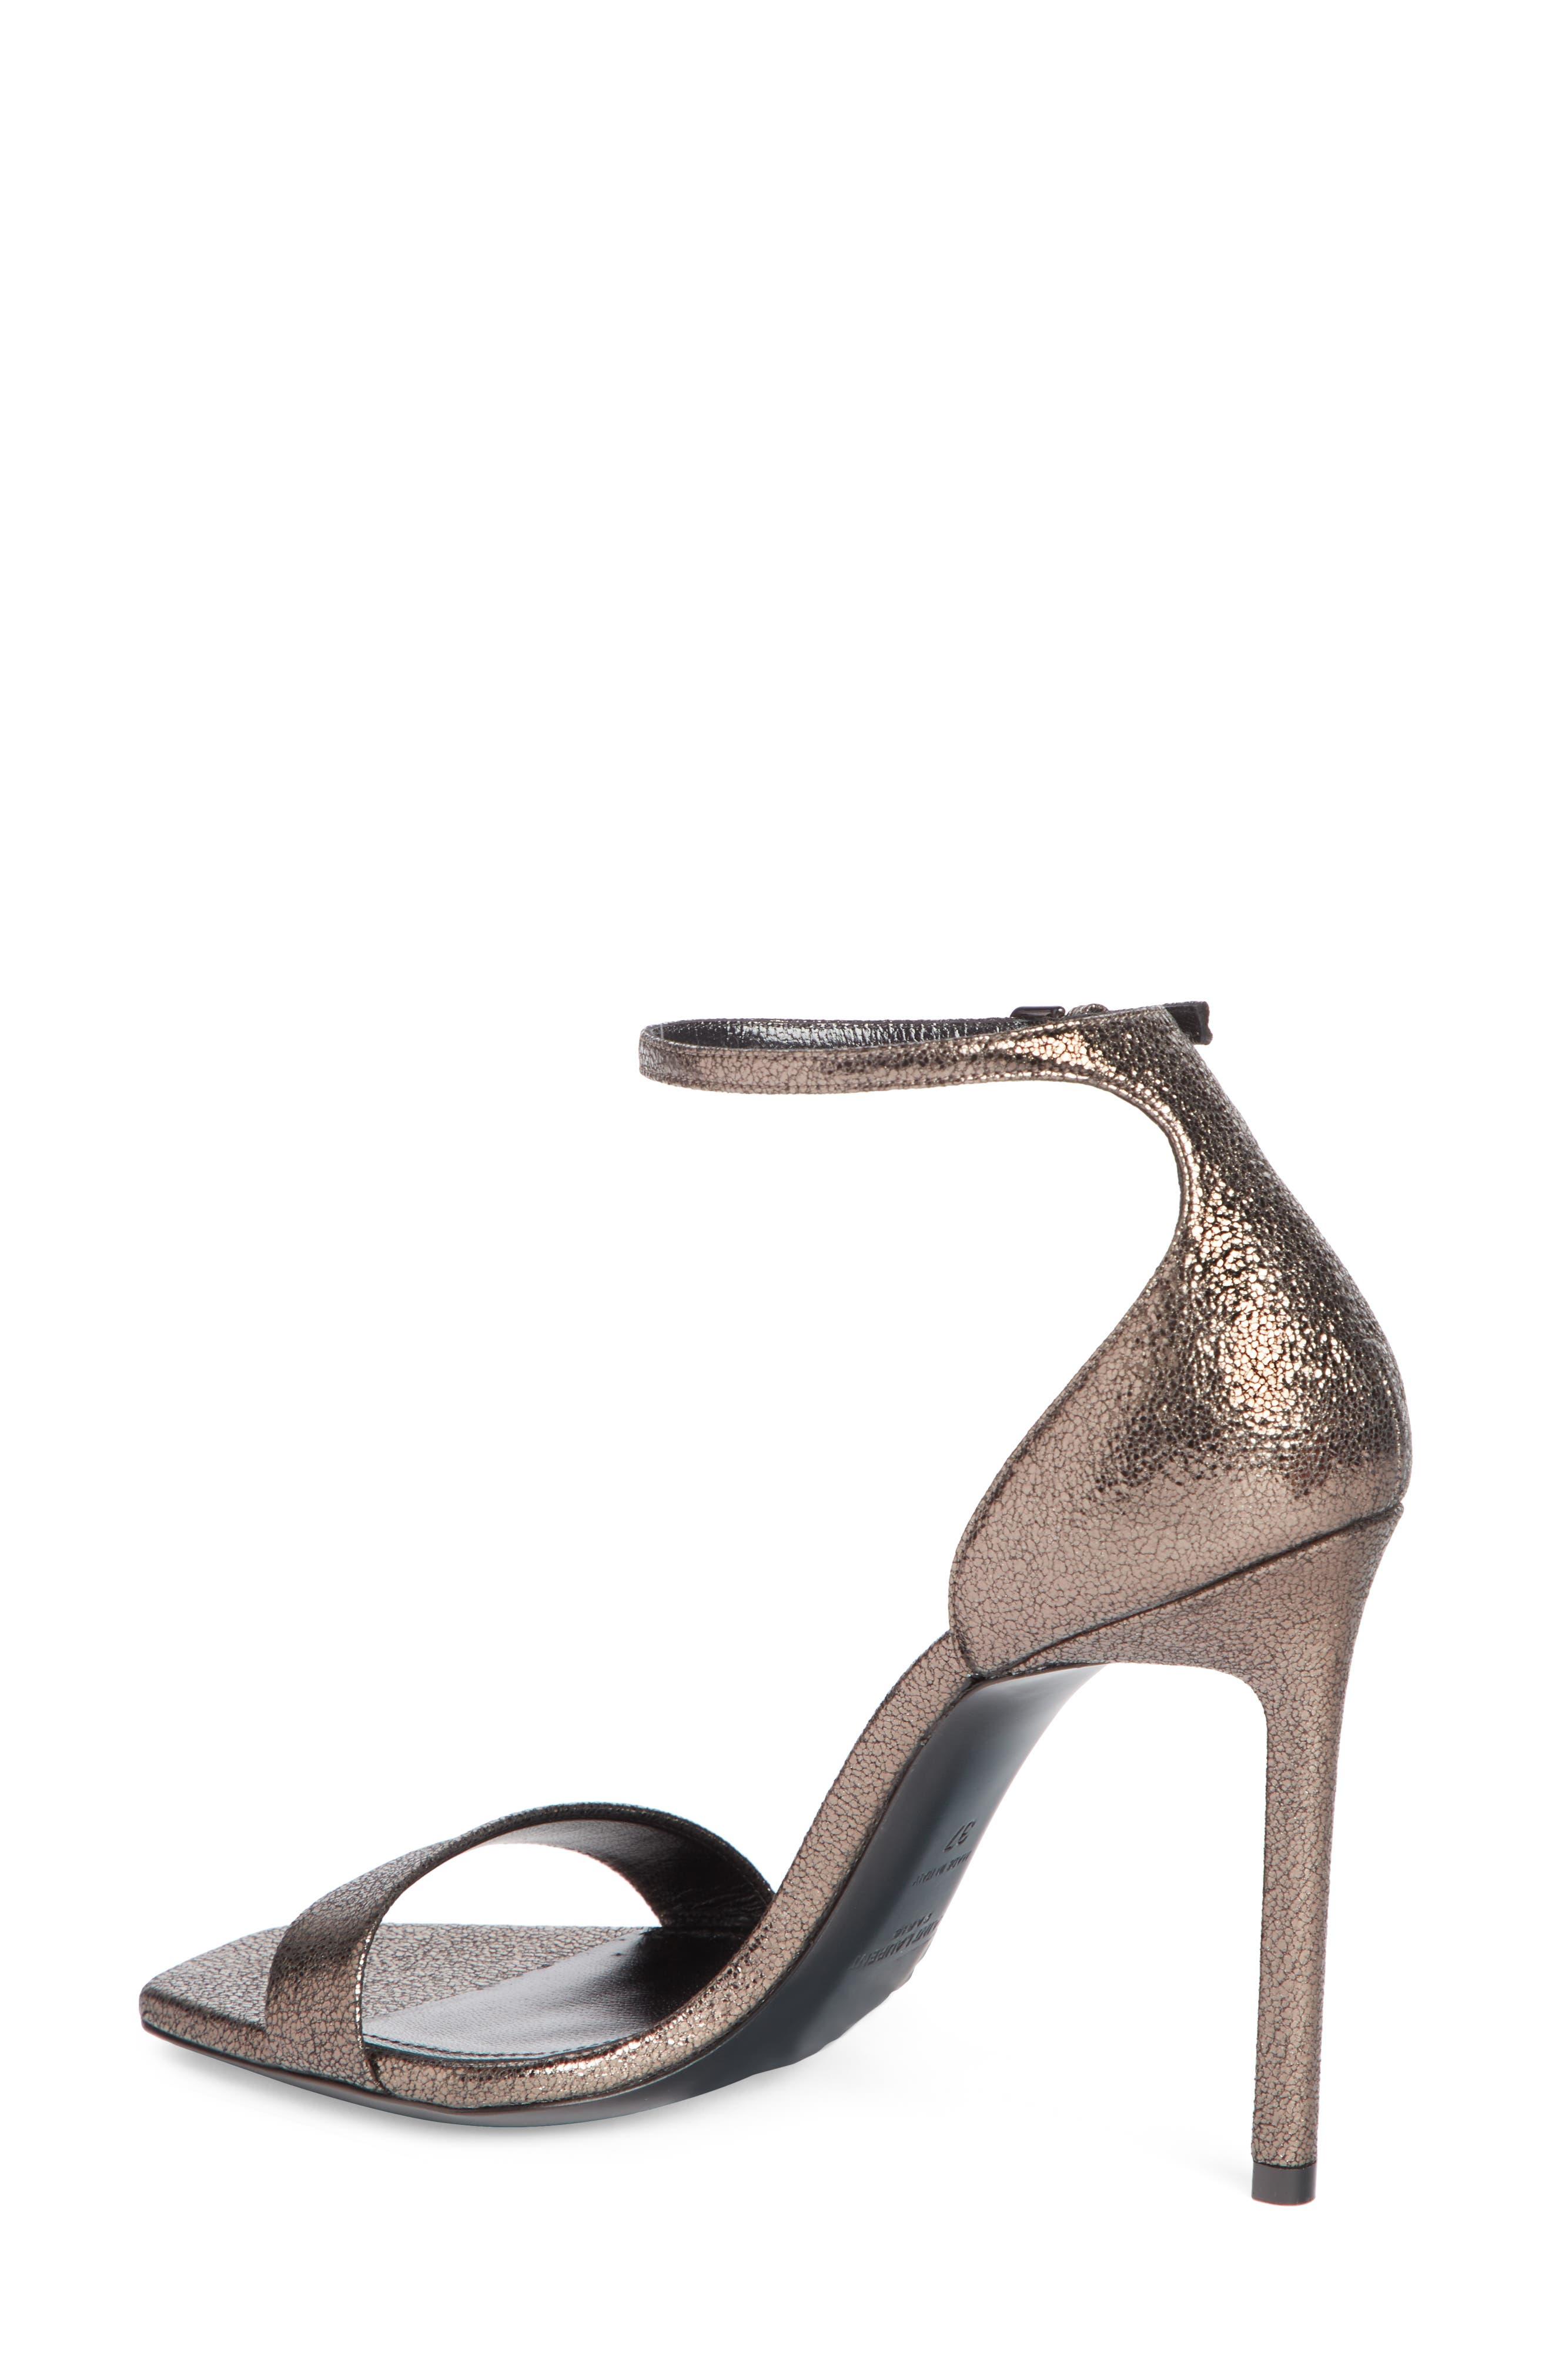 Amber Ankle Strap Sandal,                             Alternate thumbnail 2, color,                             BLACK/ METALLIC